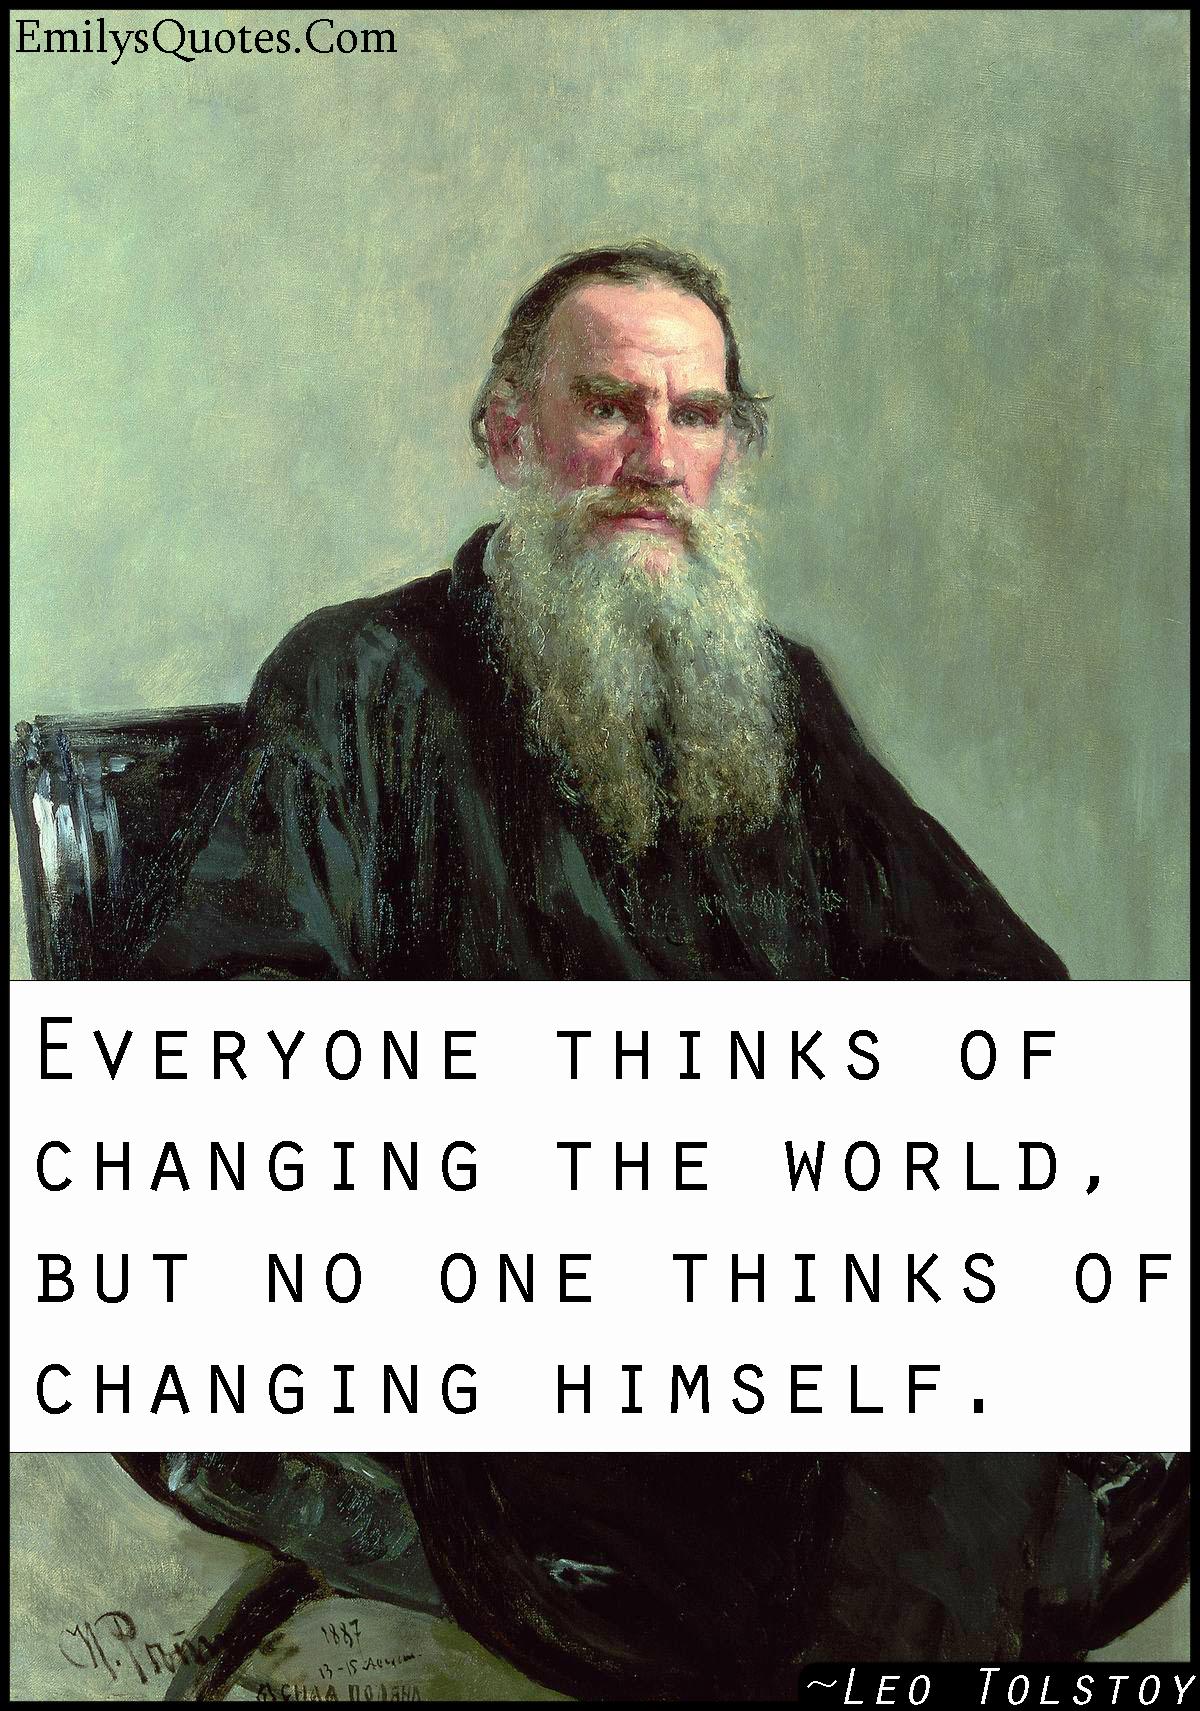 EmilysQuotes.Com - change, world, wisdom, Intelligent, Leo Tolstoy